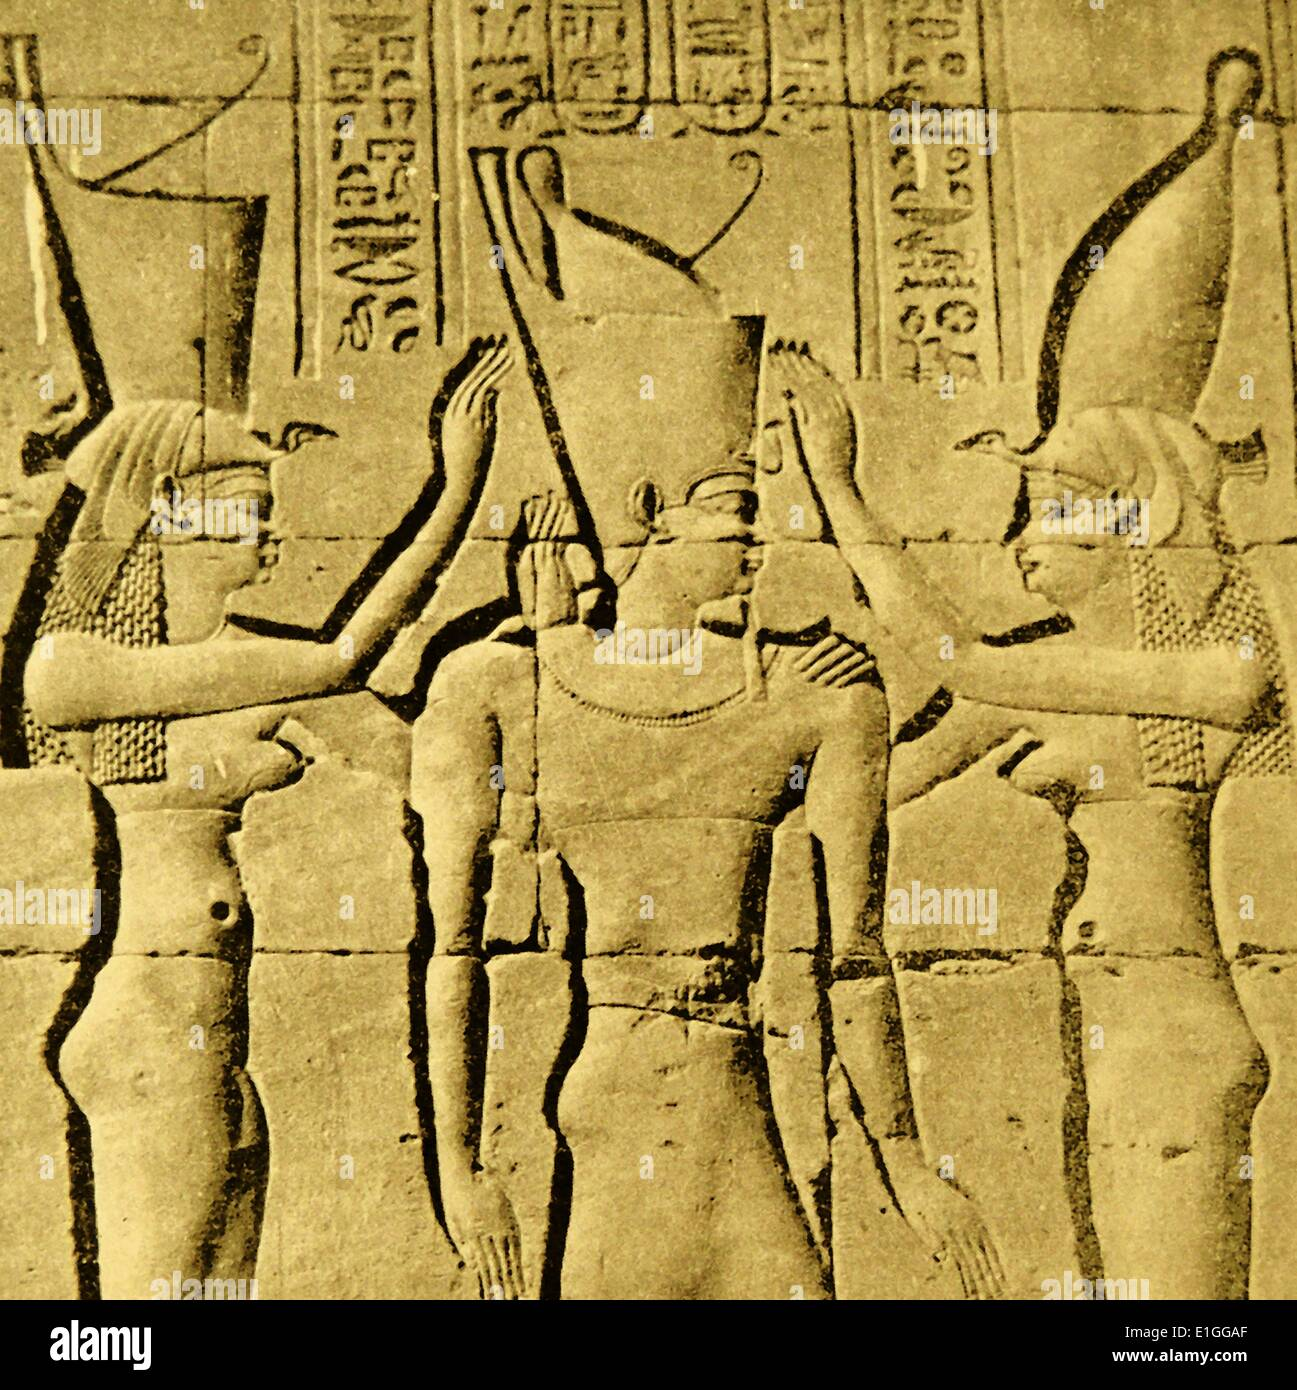 Deatil of the Coronation of Pharaoh Philaretes - Stock Image